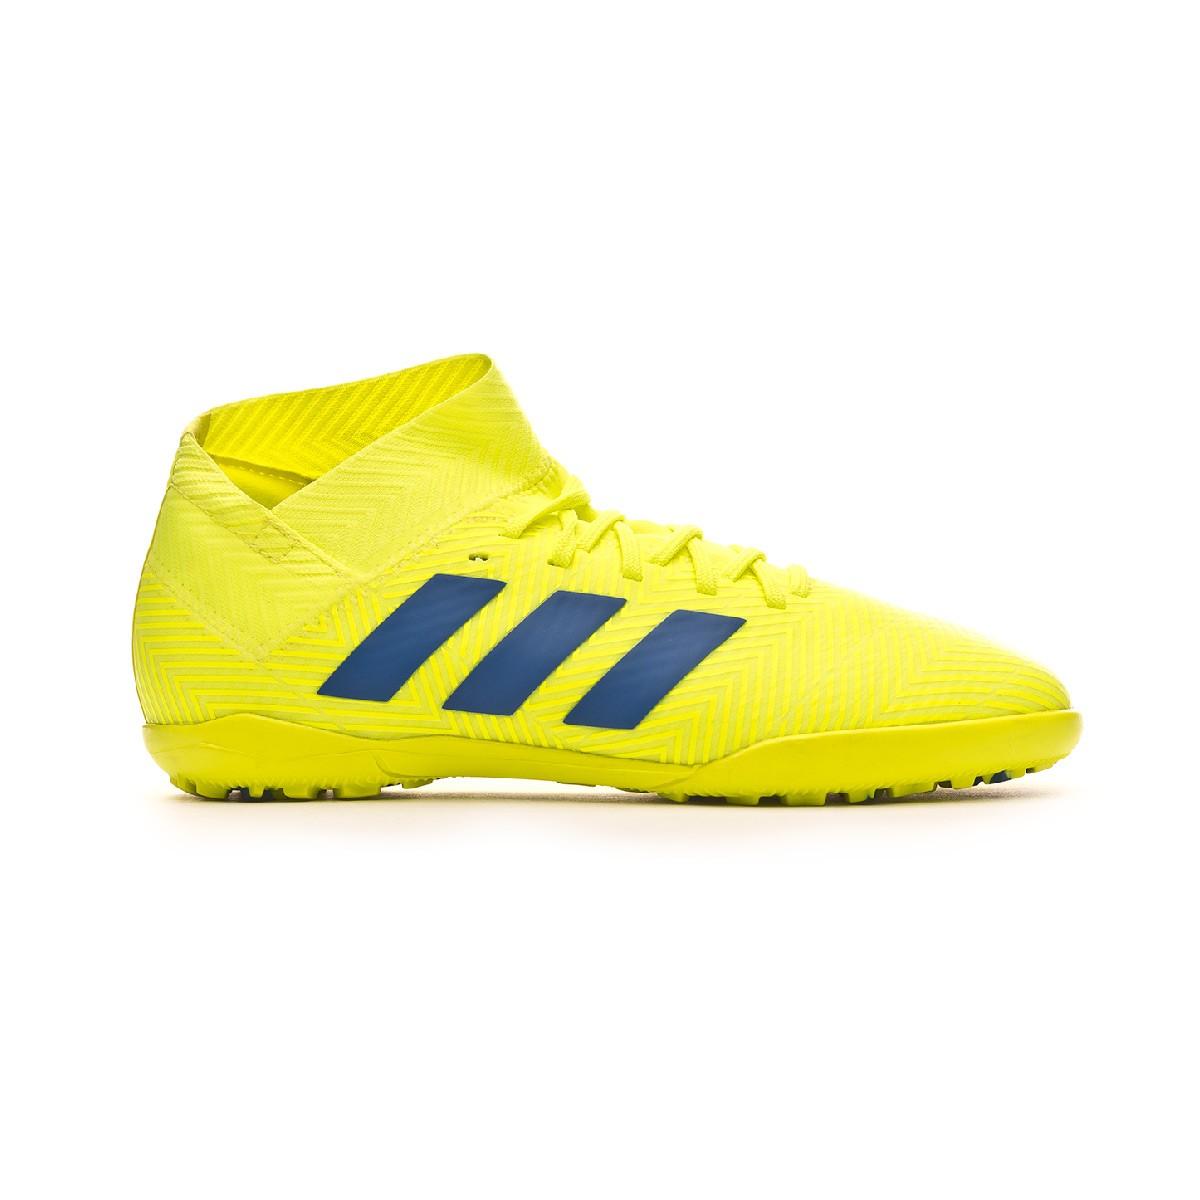 5556f30ff5f Football Boot adidas Nemeziz Tango 18.3 Turf Niño Solar yellow-Football blue -Active red - Tienda de fútbol Fútbol Emotion